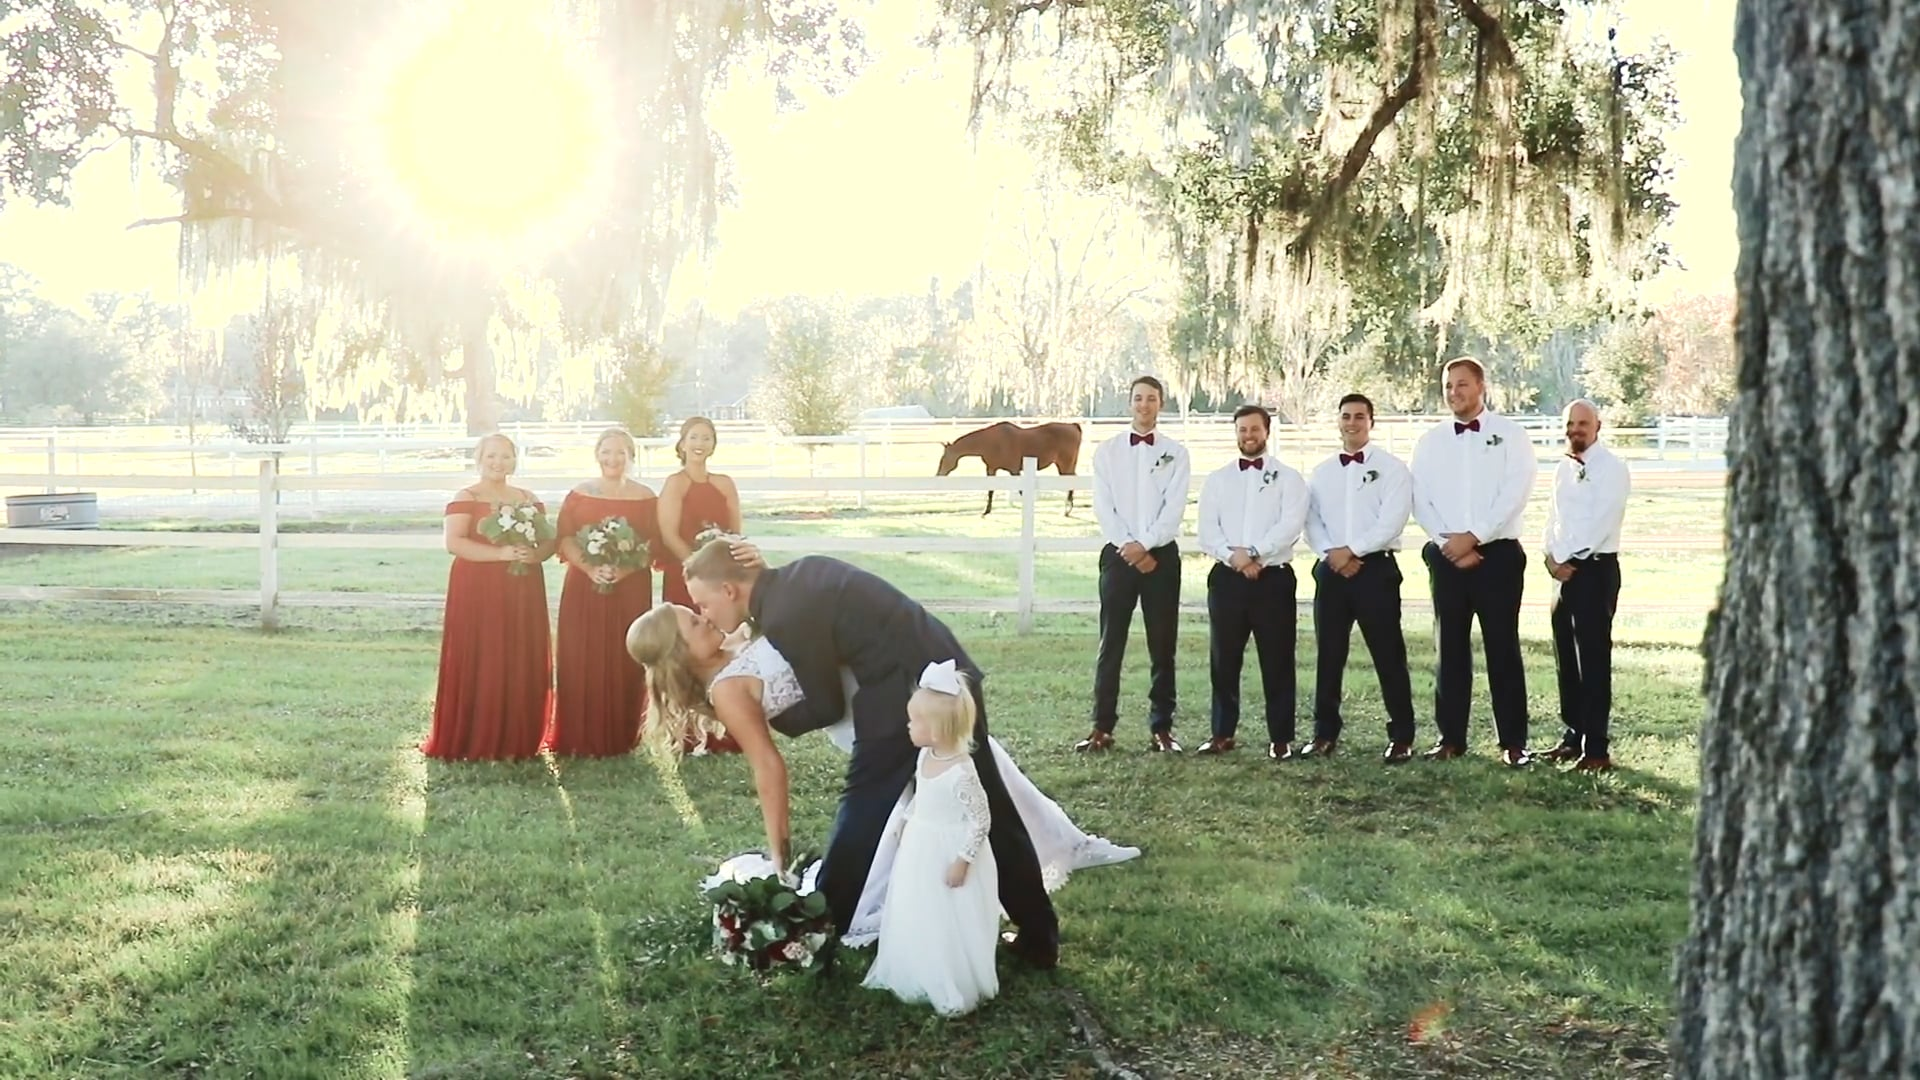 Shelby & Dillon | Wedding Film